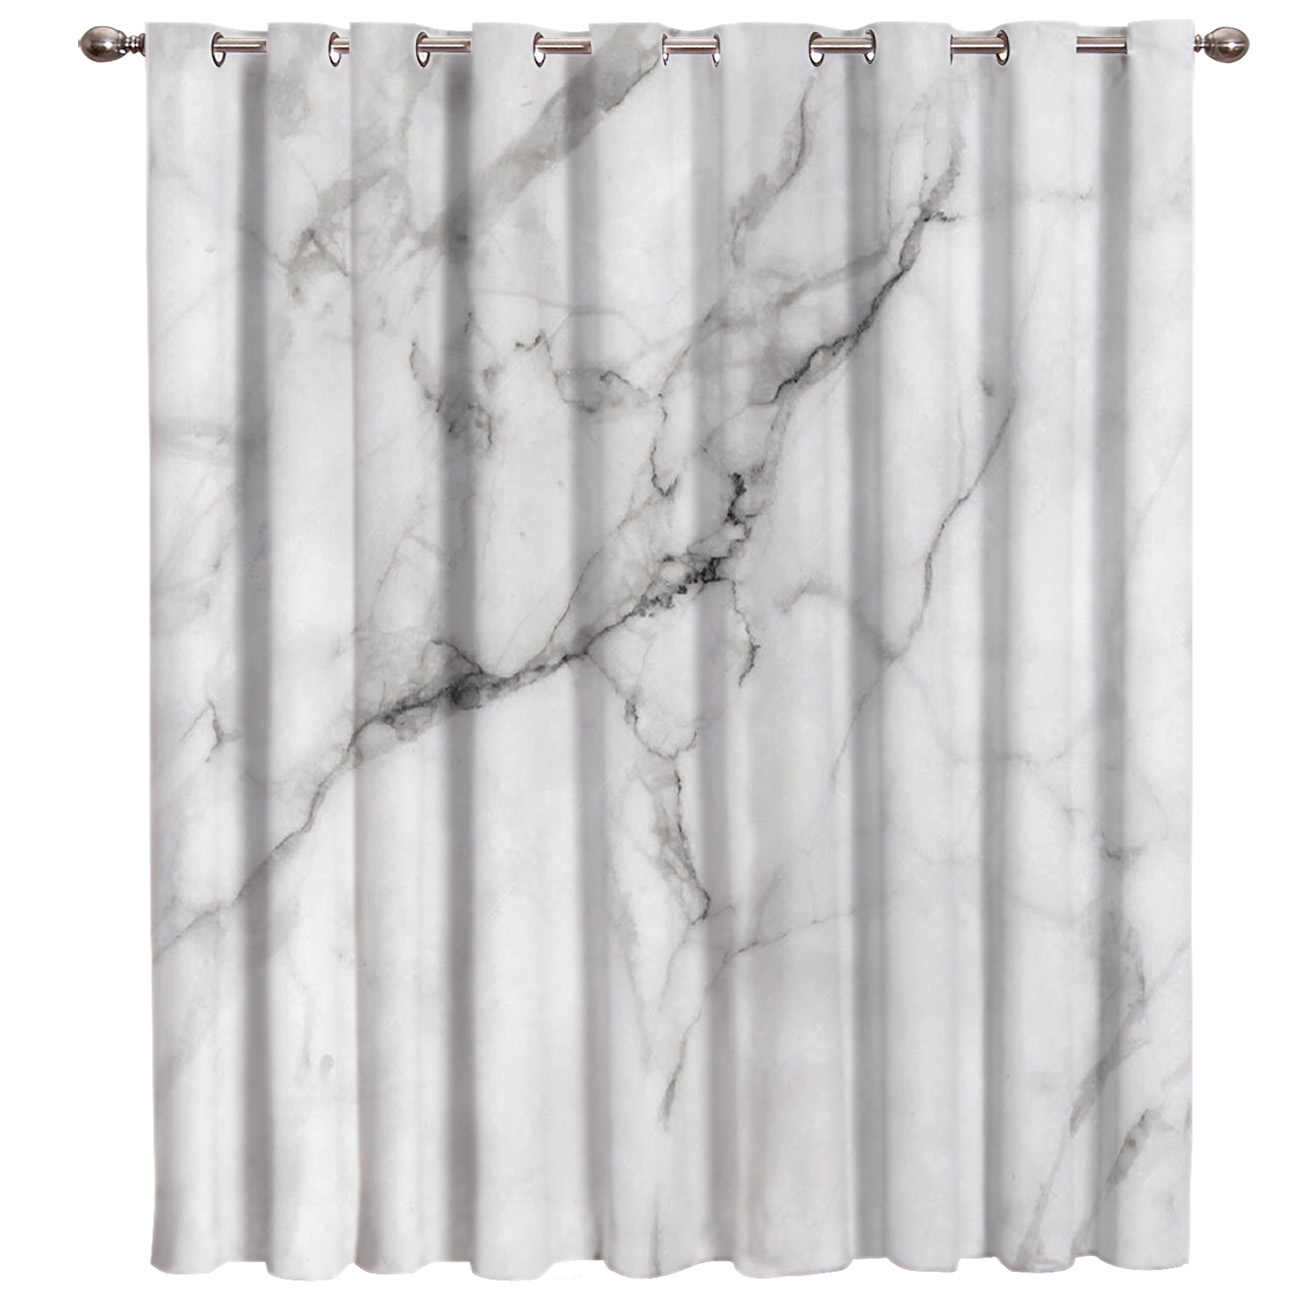 white marble crackle window treatments curtains valance decor bedroom kitchen fabric decor print kids curtain panels